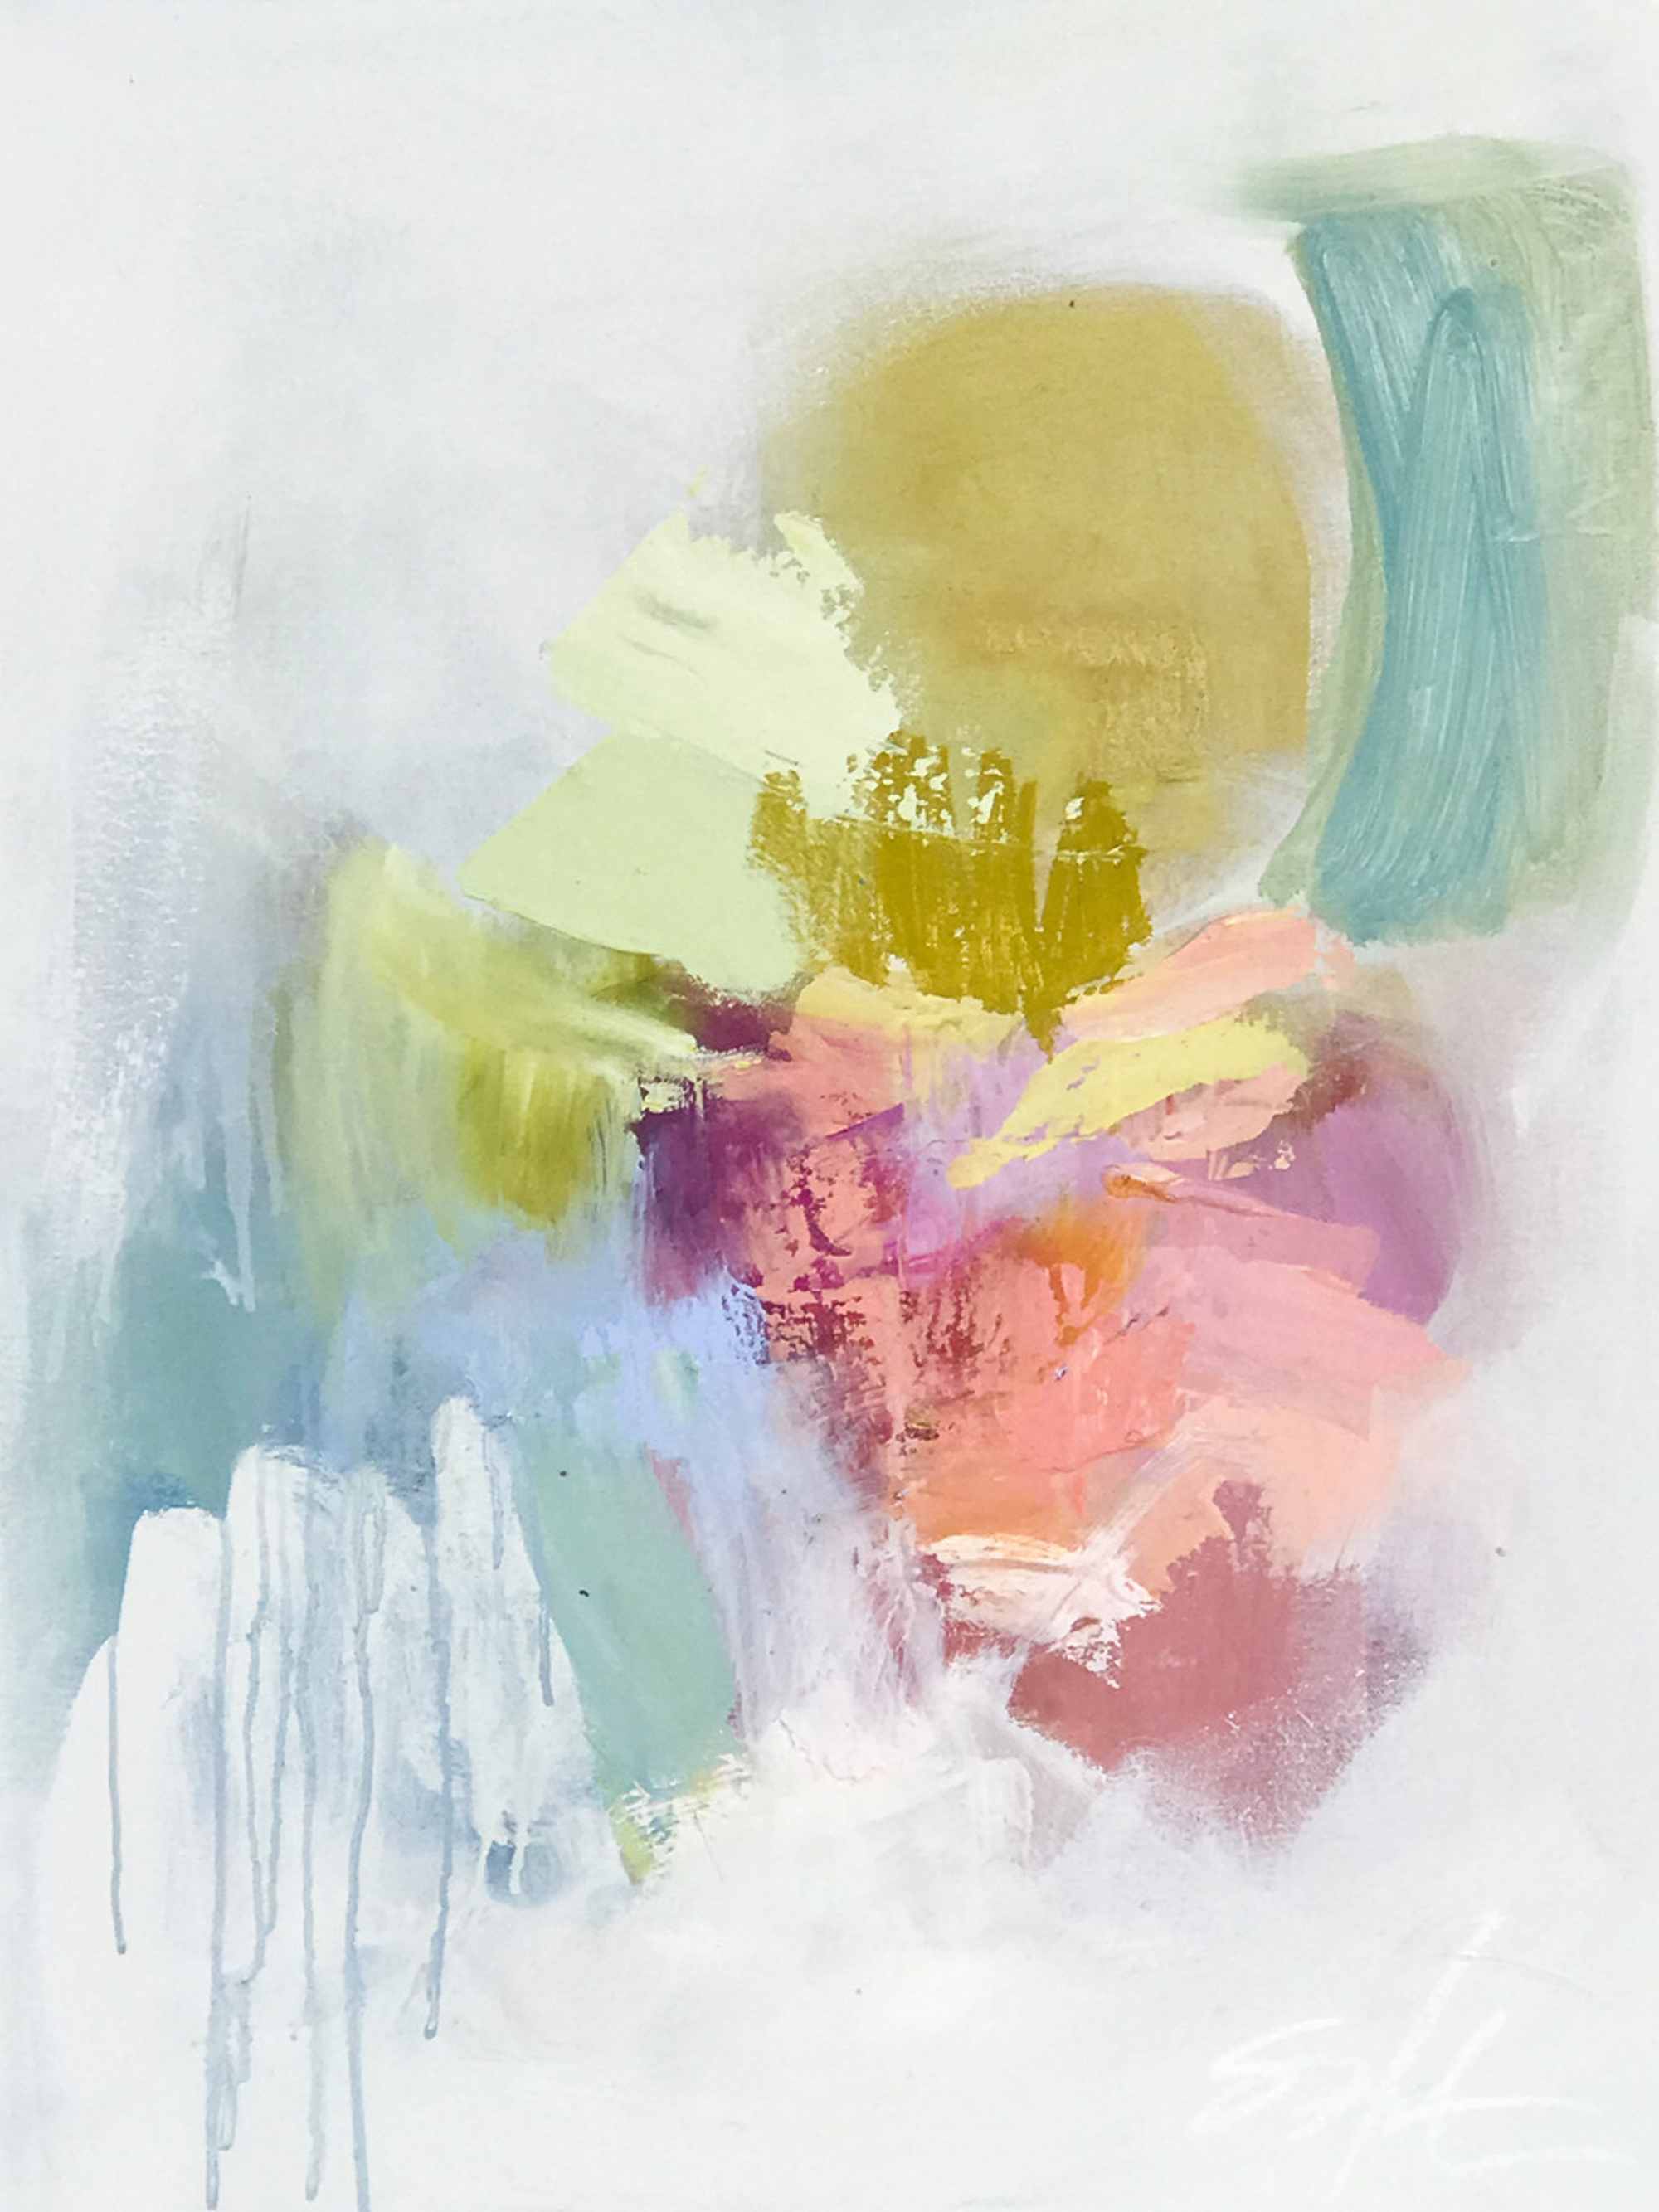 Wandering Hope III by Sarah Otts